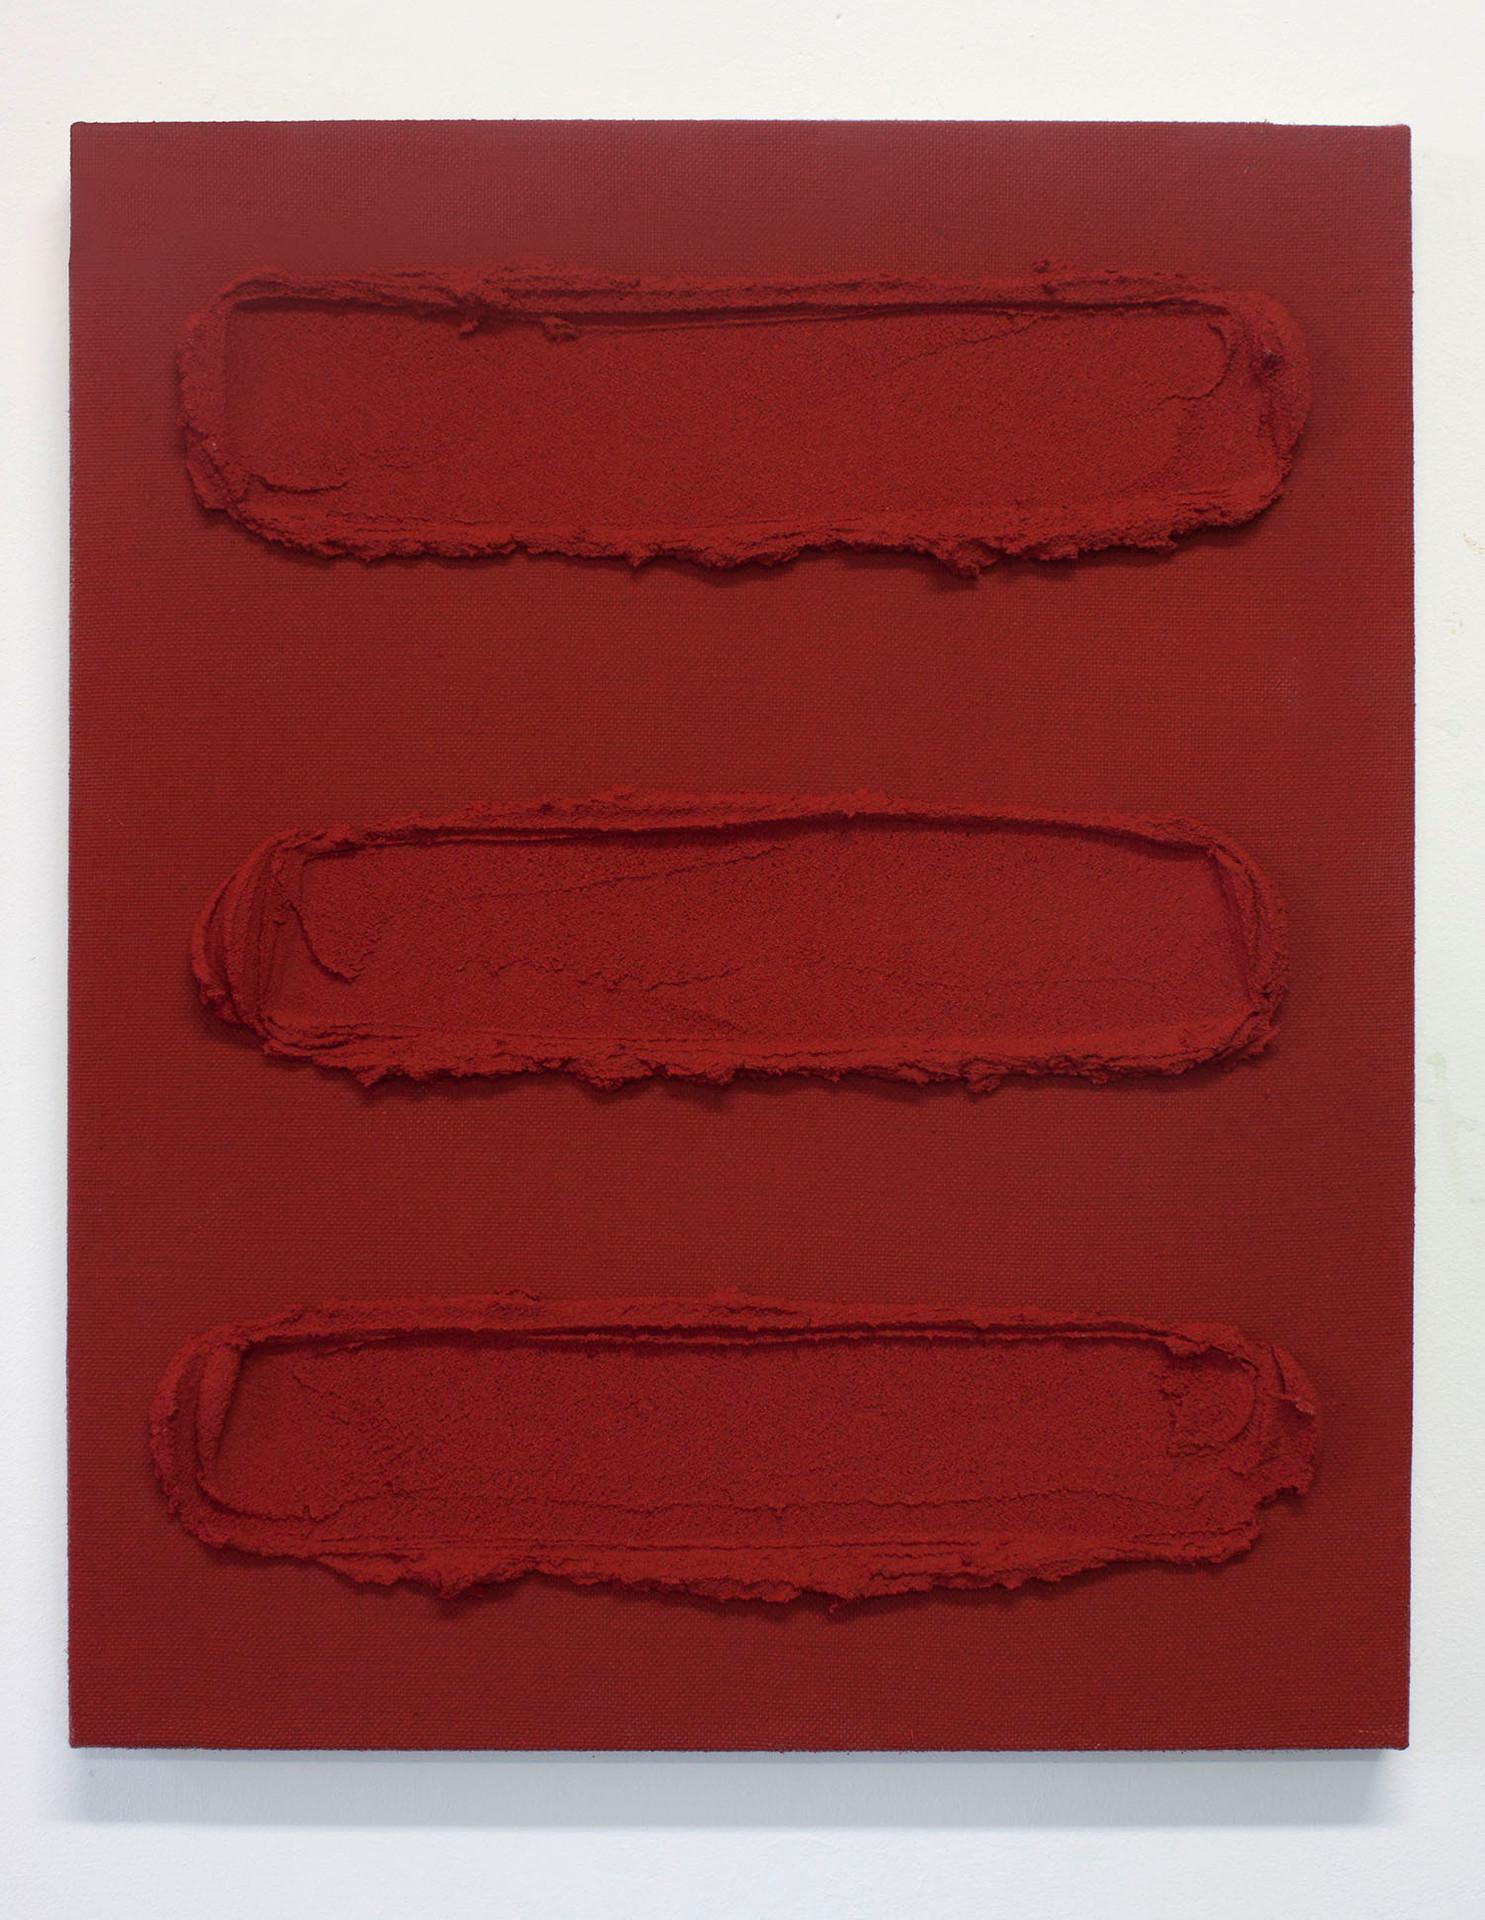 Pintura S07, 2019. Acrylic, sand and limestone on linen. 55 x 46 cm.